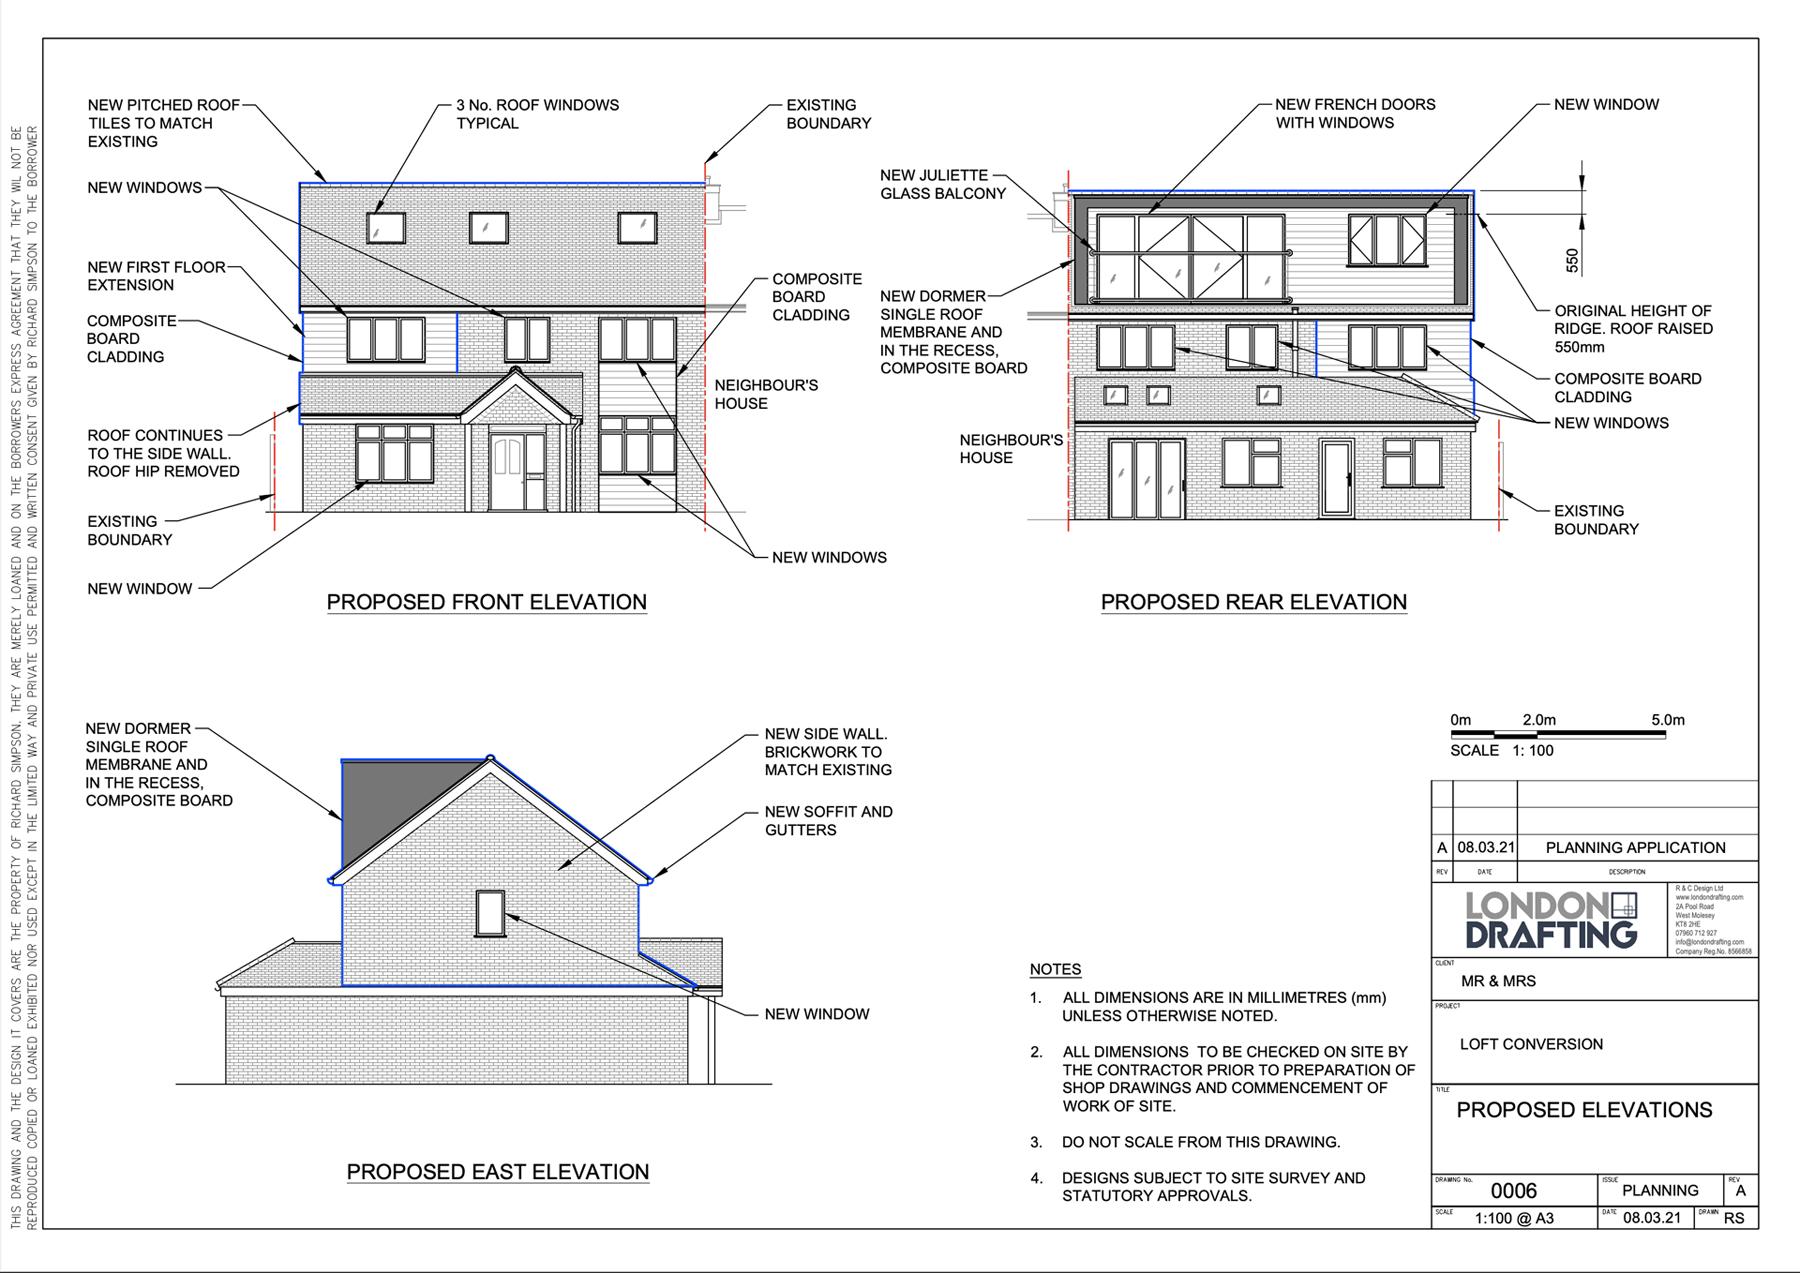 Loft conversion plans drawn